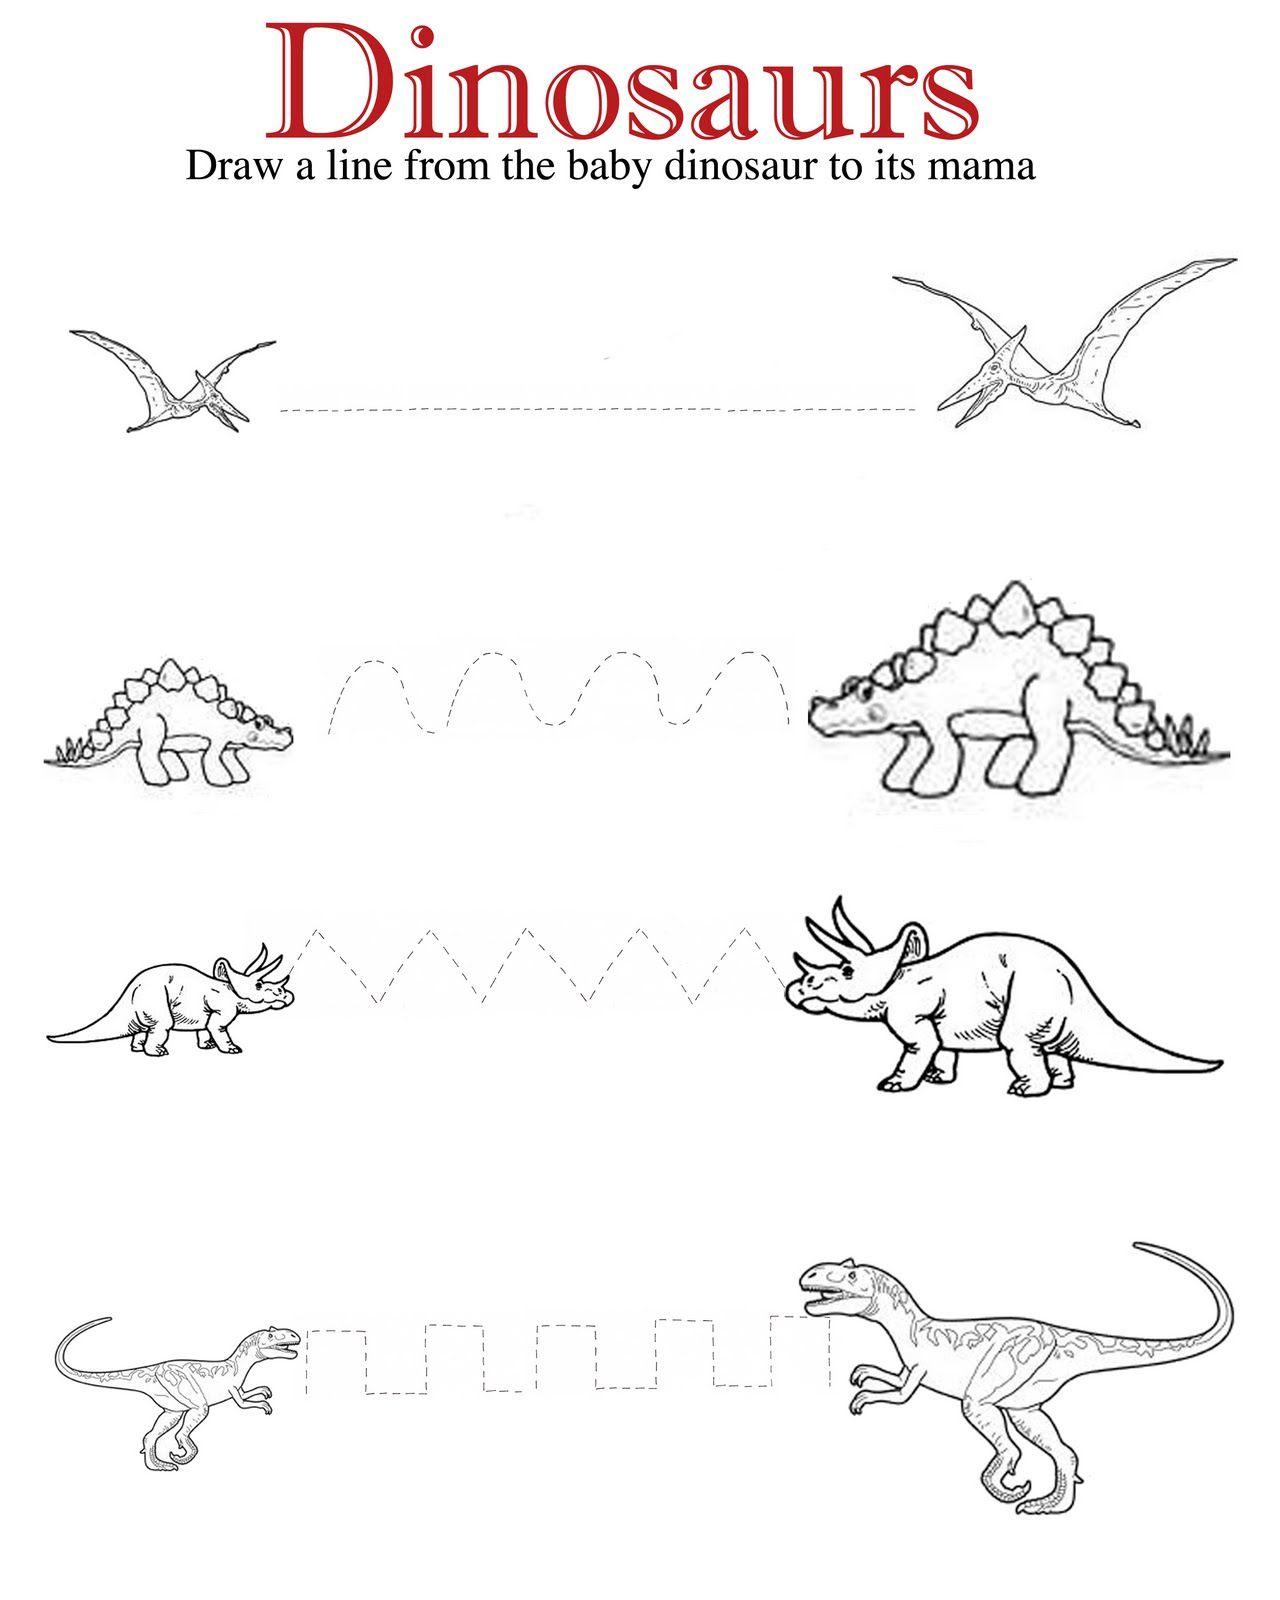 Dinosaurs Preschool Dinosaur Theme Preschool Dinosaur Activities [ 1600 x 1280 Pixel ]